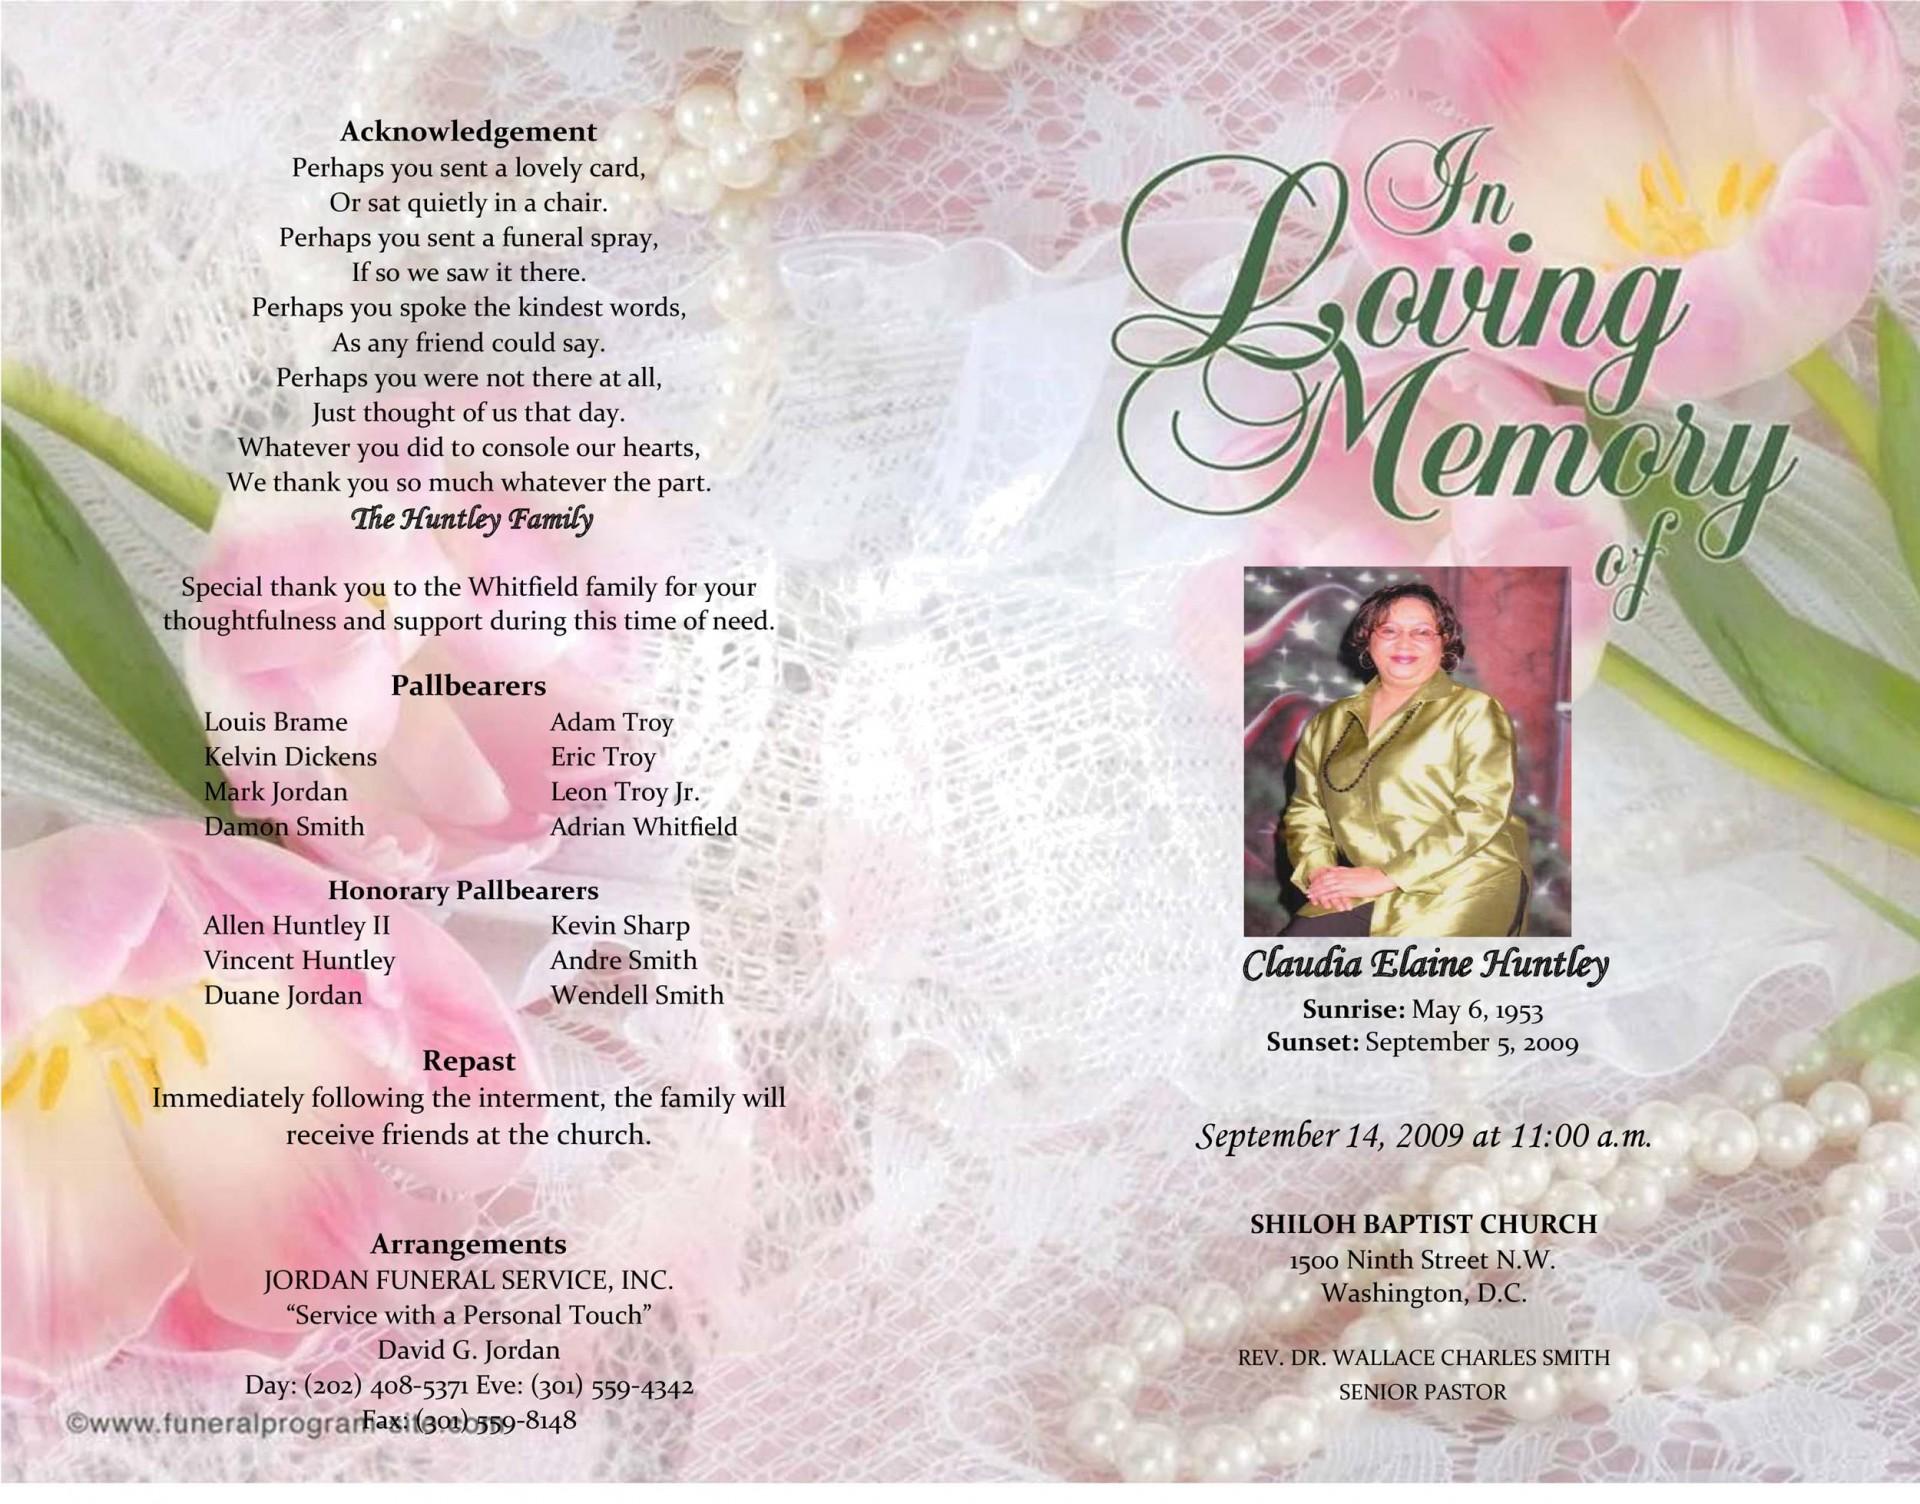 007 Fantastic Free Funeral Program Template High Resolution  Word Catholic Editable Pdf1920